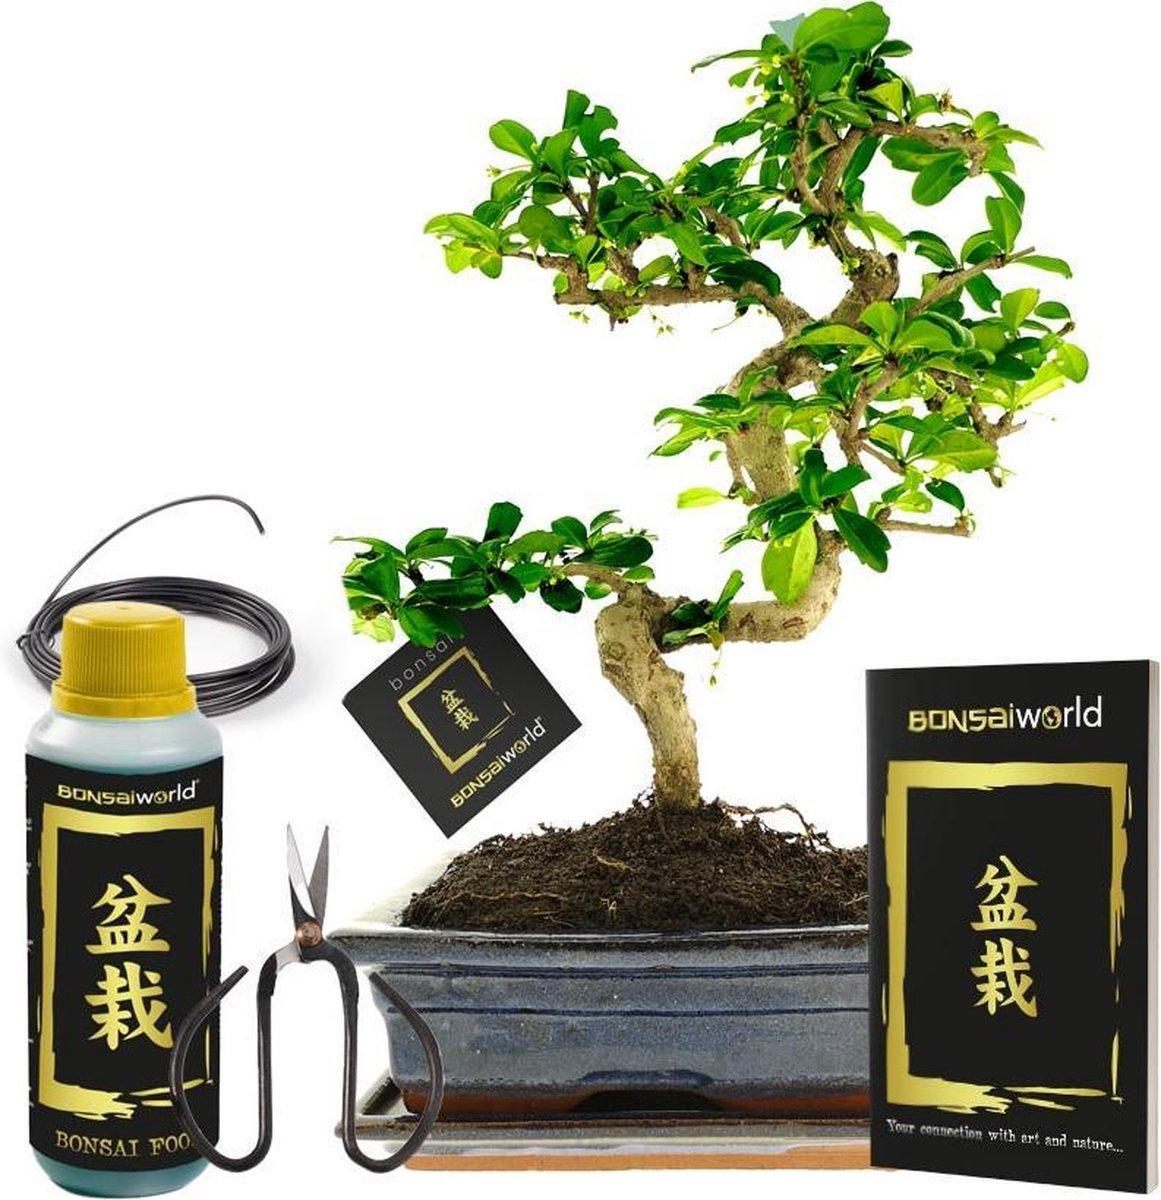 Bonsaiworld Bonsai Boom XL - 6-Delige Set - 12 jaar oud -    30-35 cm